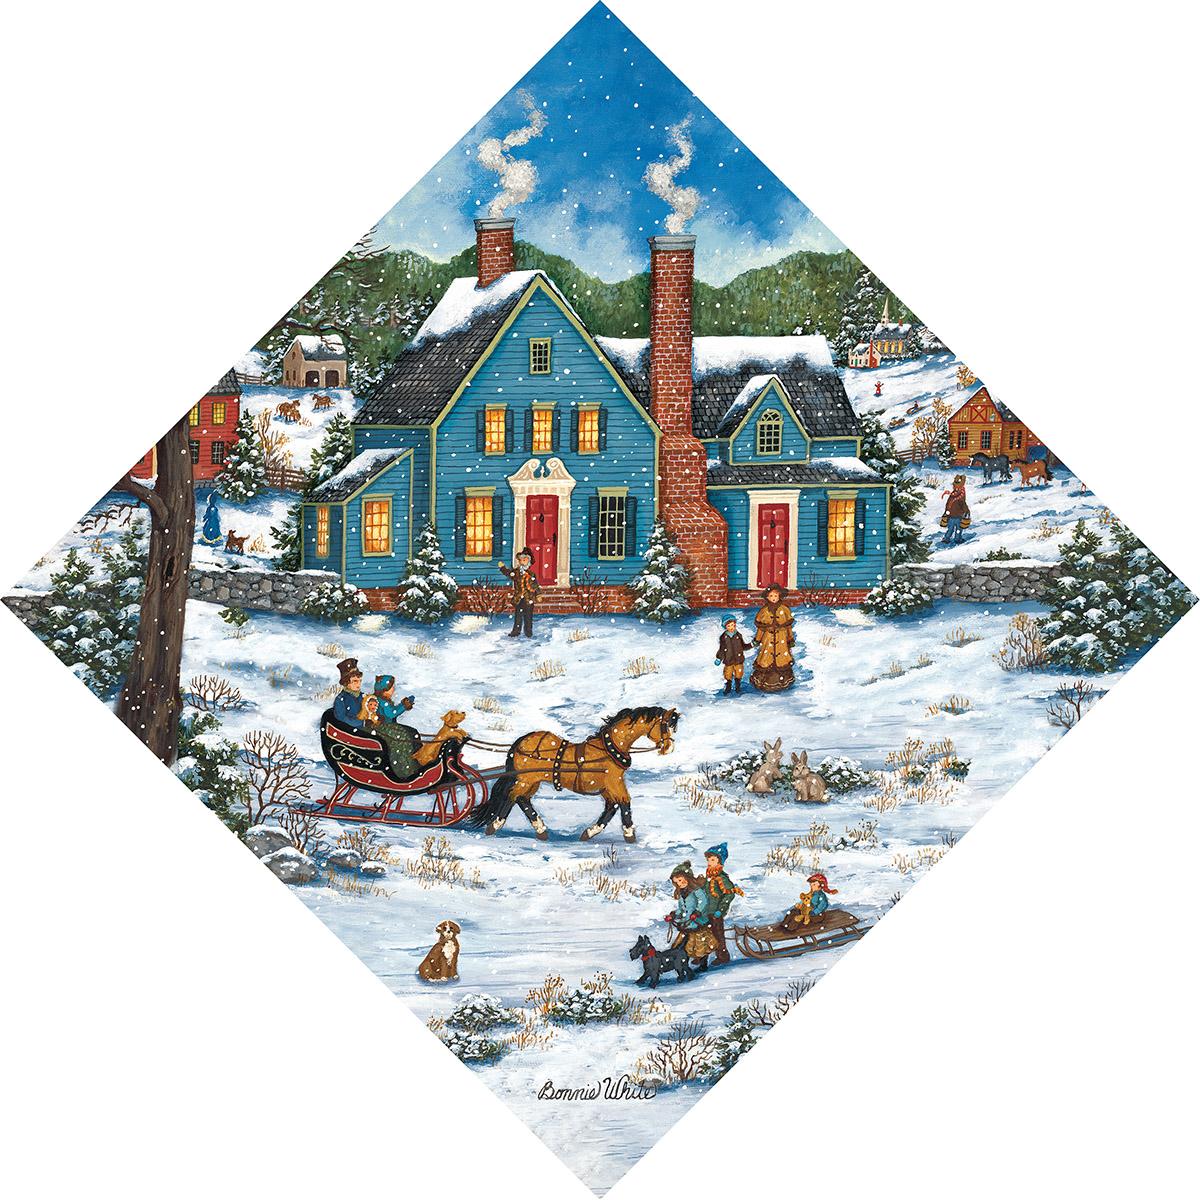 Heading Home Shaped Puzzle Puzzlewarehouse Com